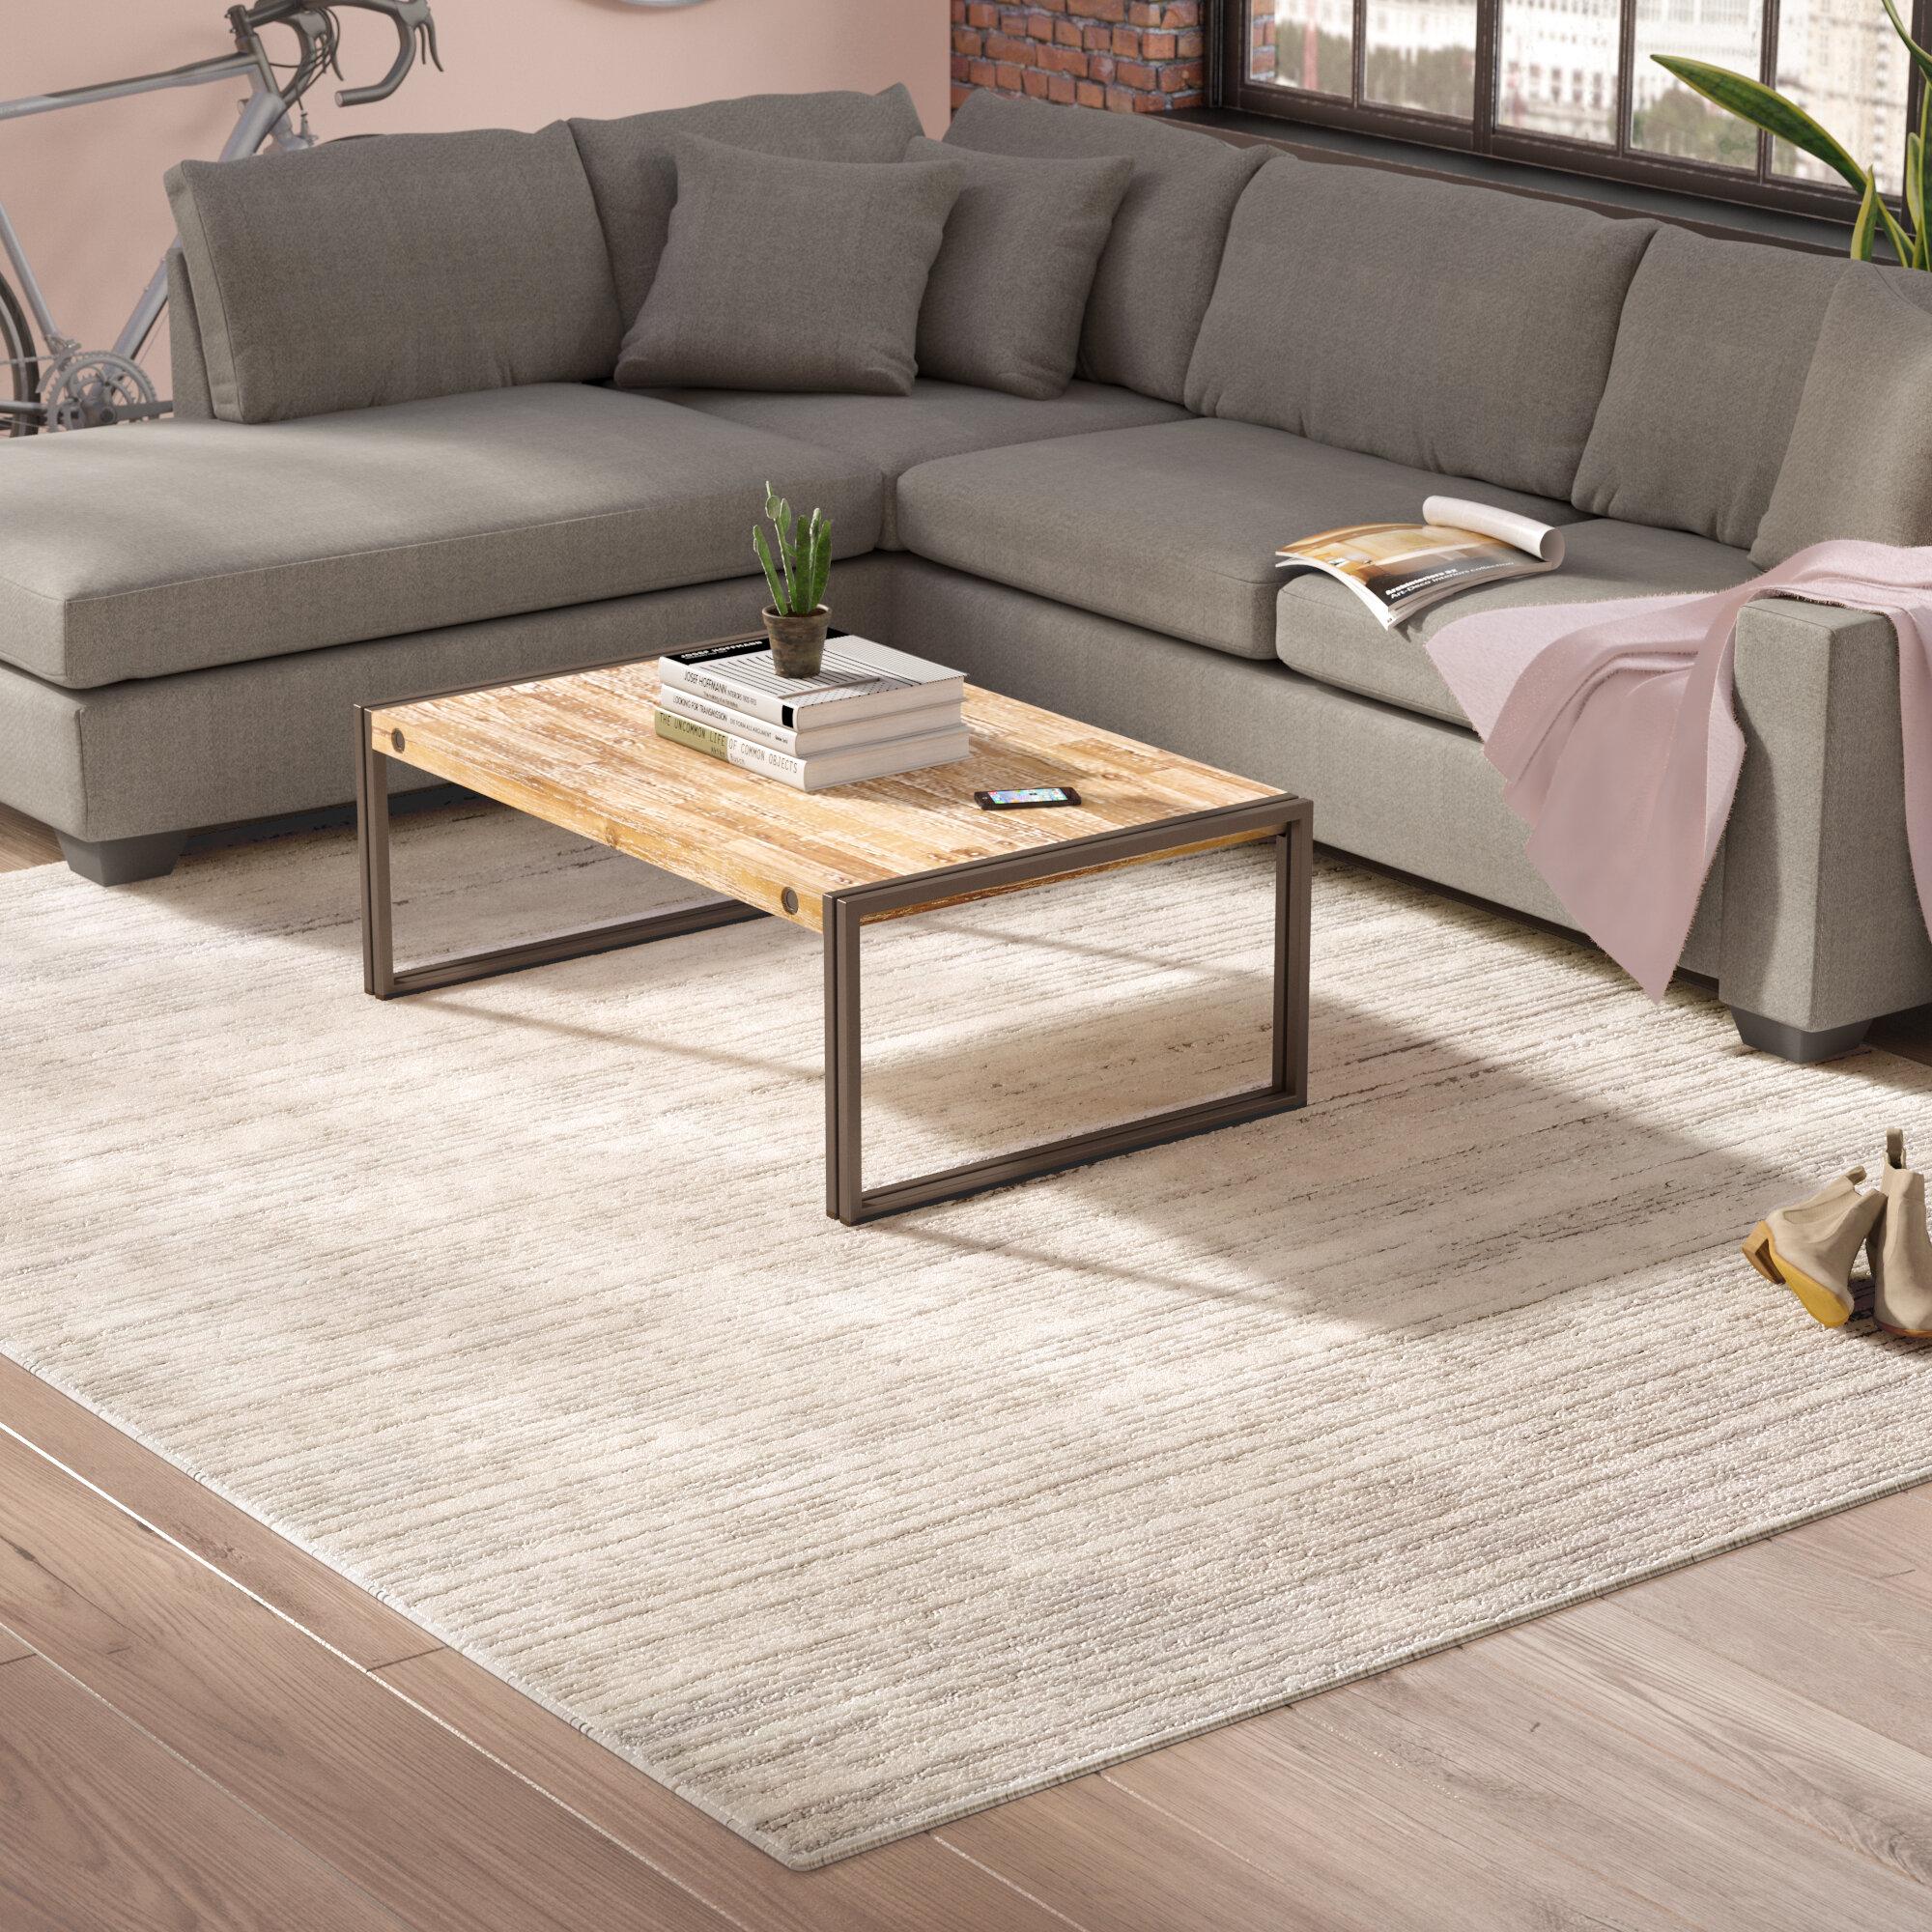 Greyleigh bridgeton distressed modern grey cream sleek area rug reviews wayfair ca